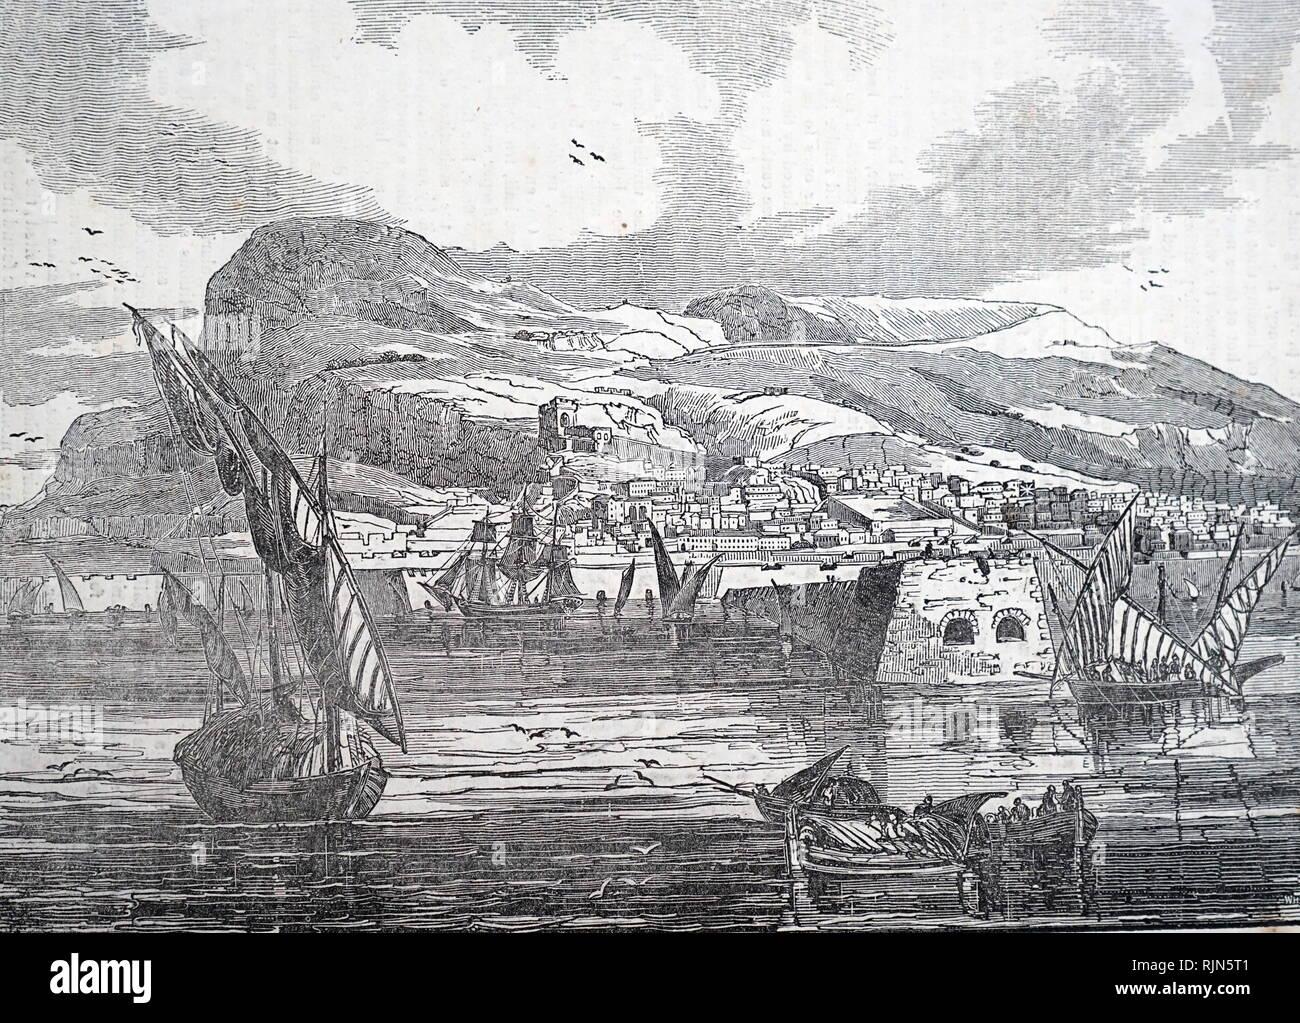 Illustration showing Gibraltar in 1833 - Stock Image